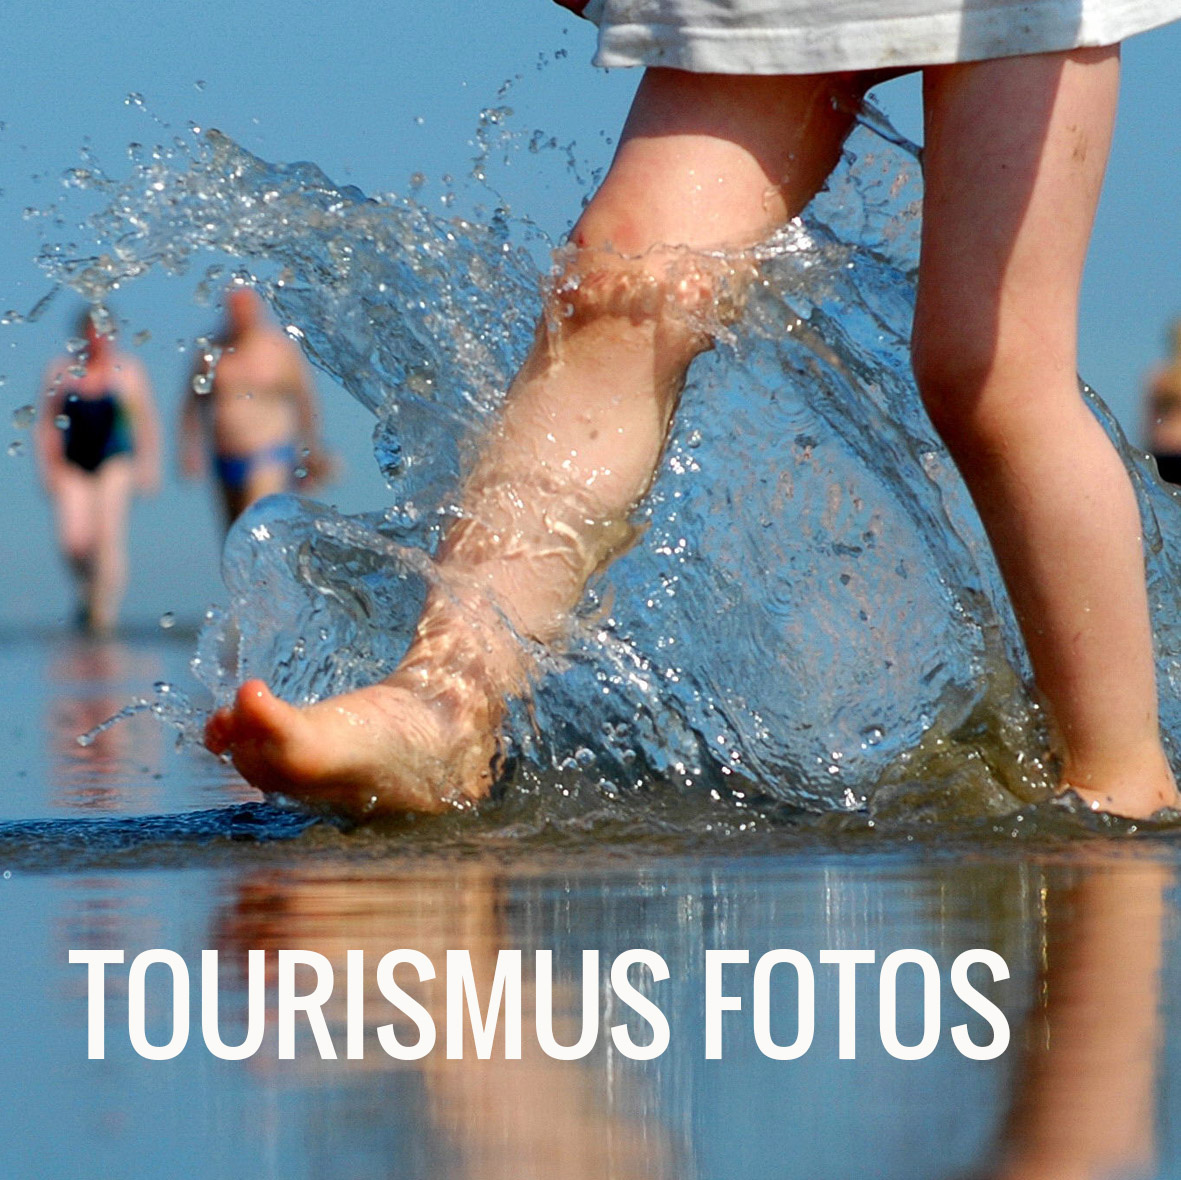 Tourismus Fotos